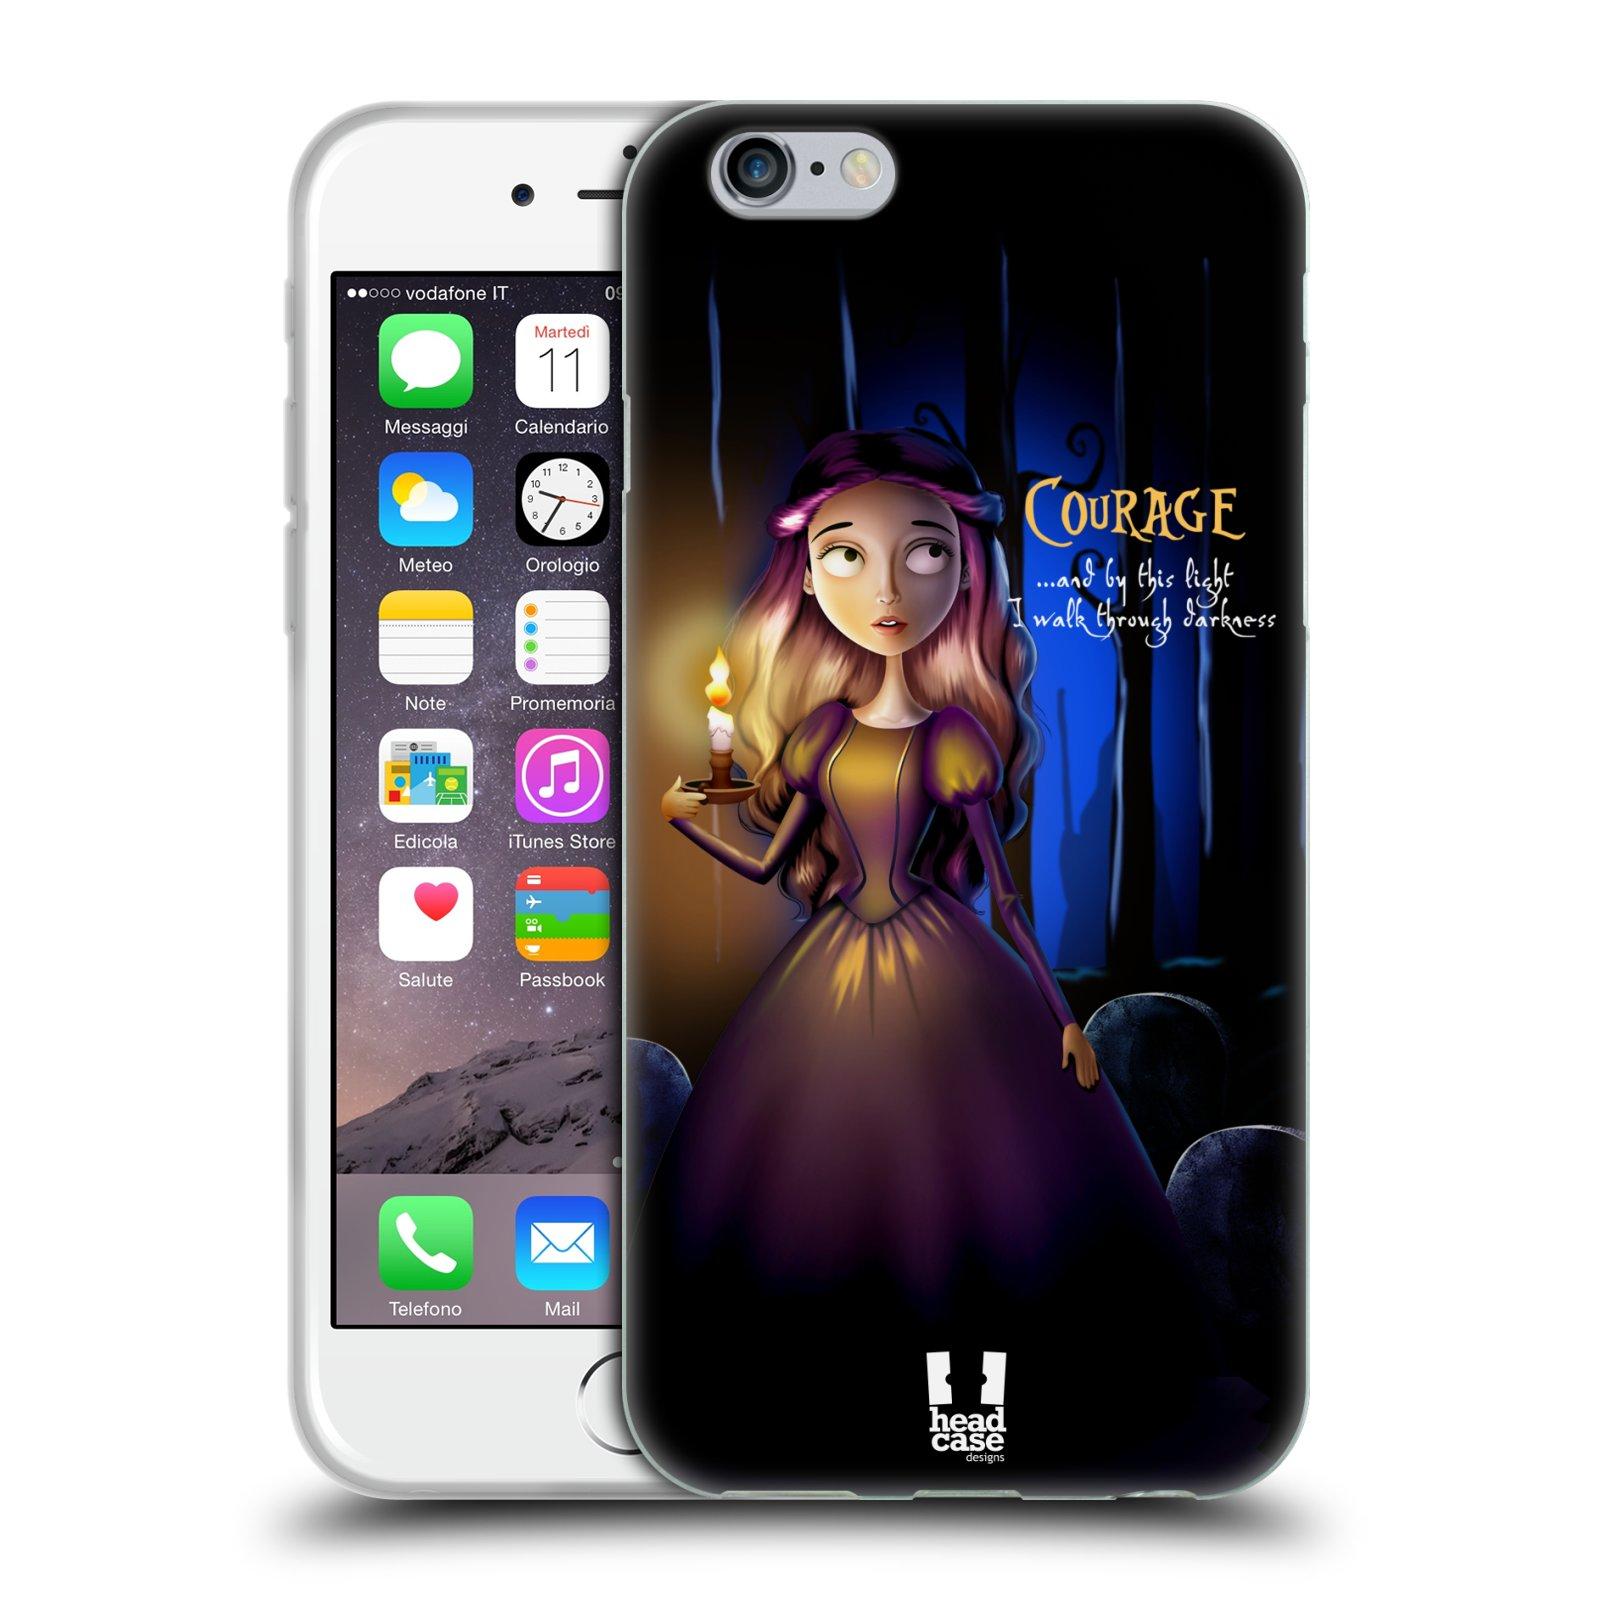 Silikonové pouzdro na mobil Apple iPhone 6 a 6S HEAD CASE MACABRE COURAGE